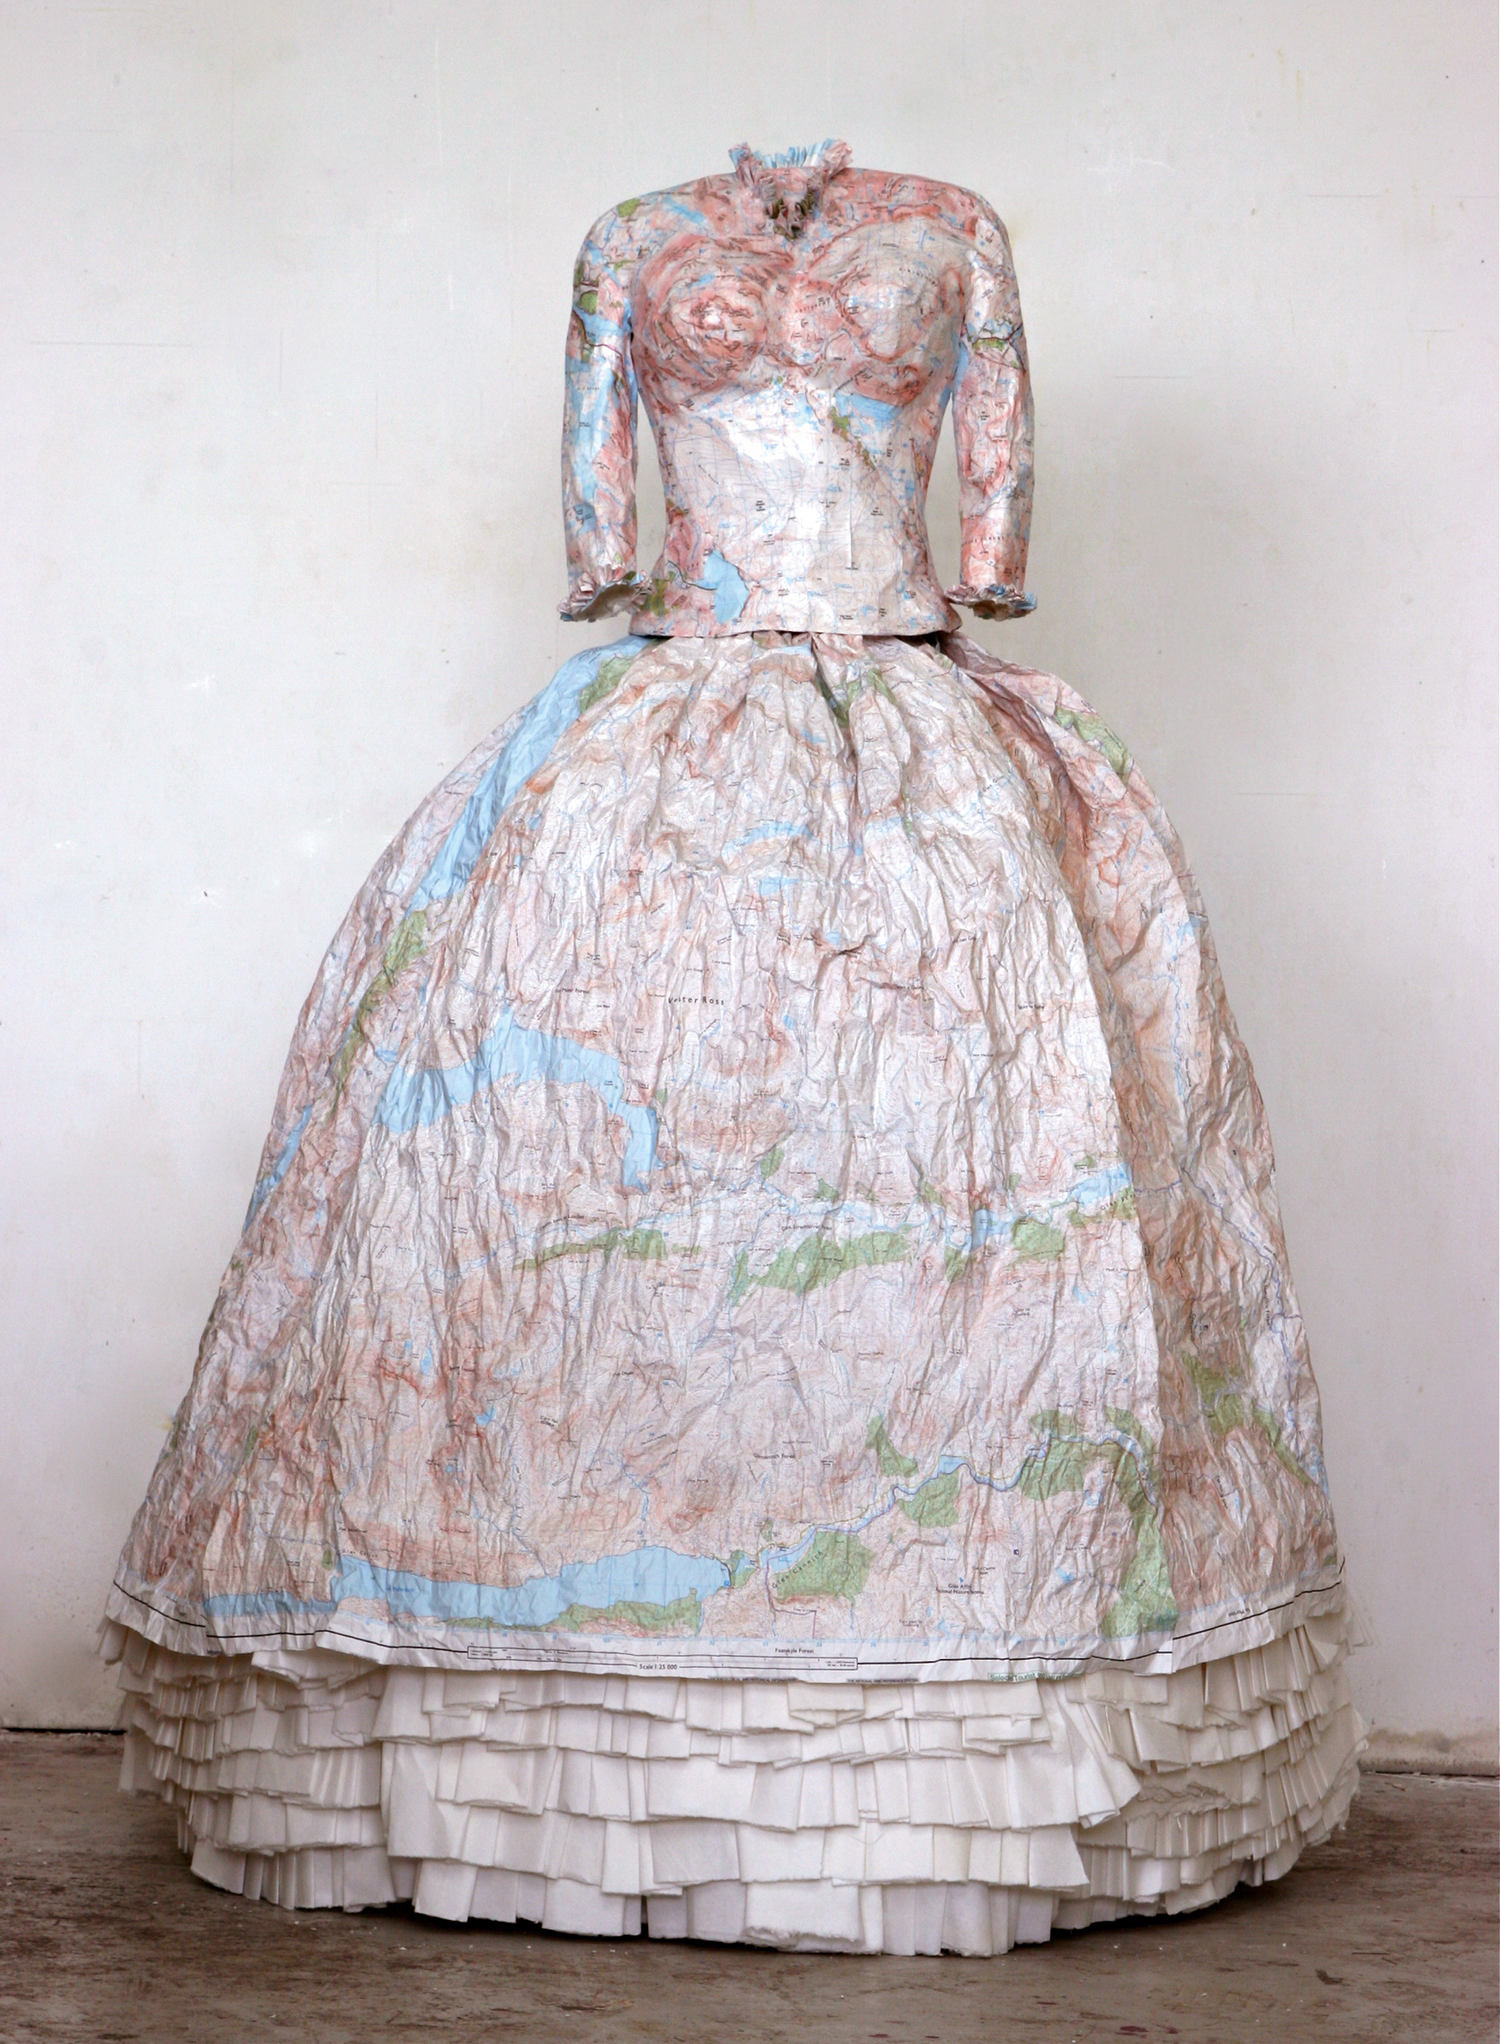 Highland Dress, robe@(60 x 95 x 150 cm)